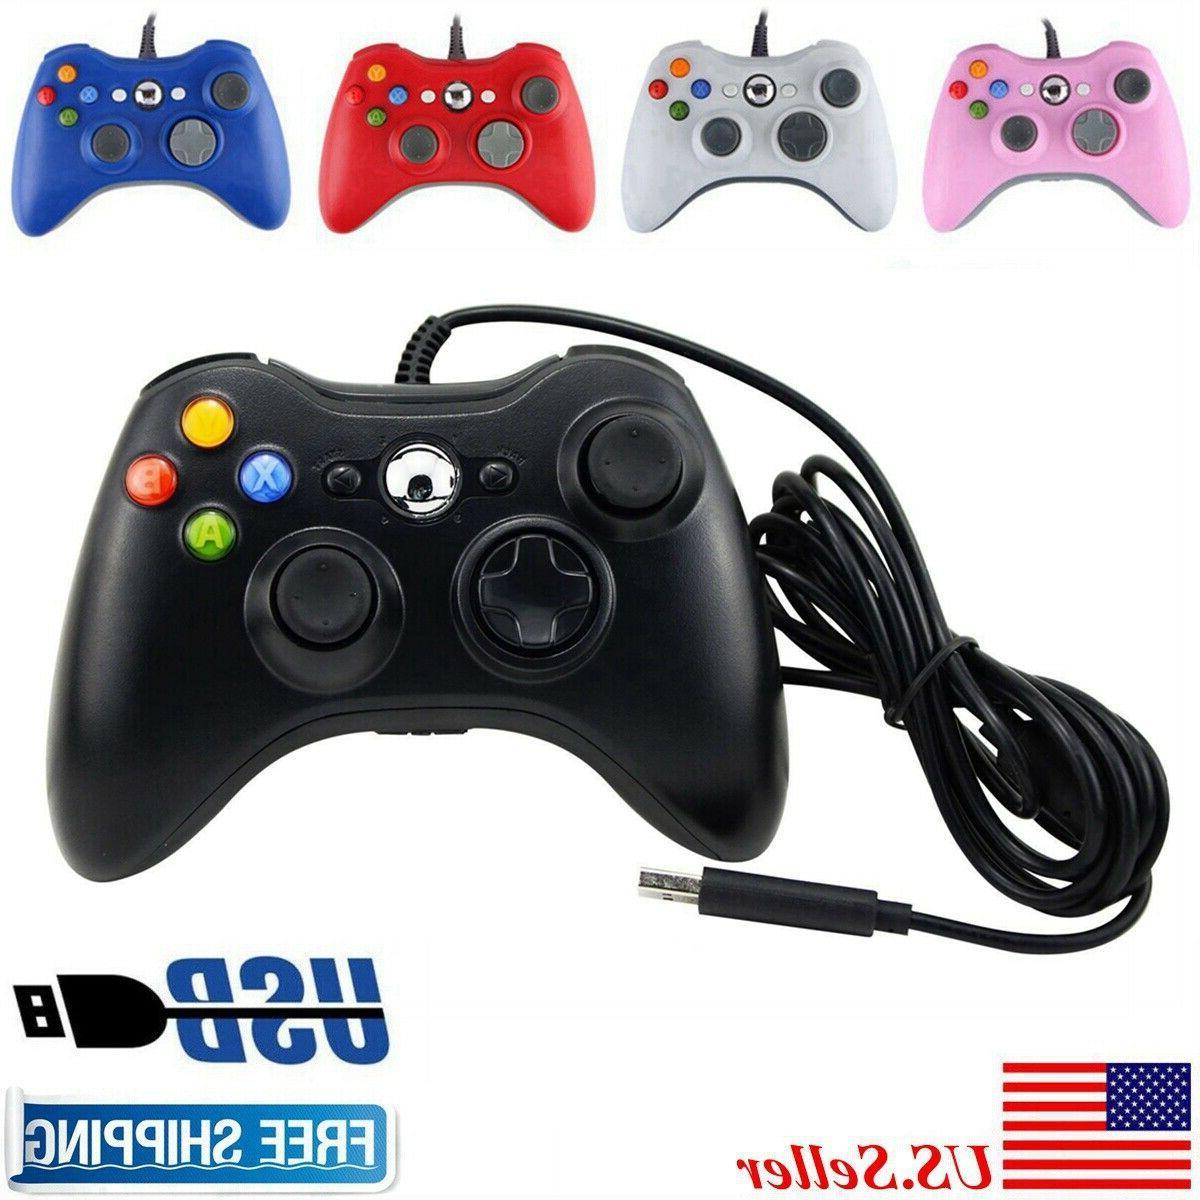 new usb gamepad controller for microsoft xbox